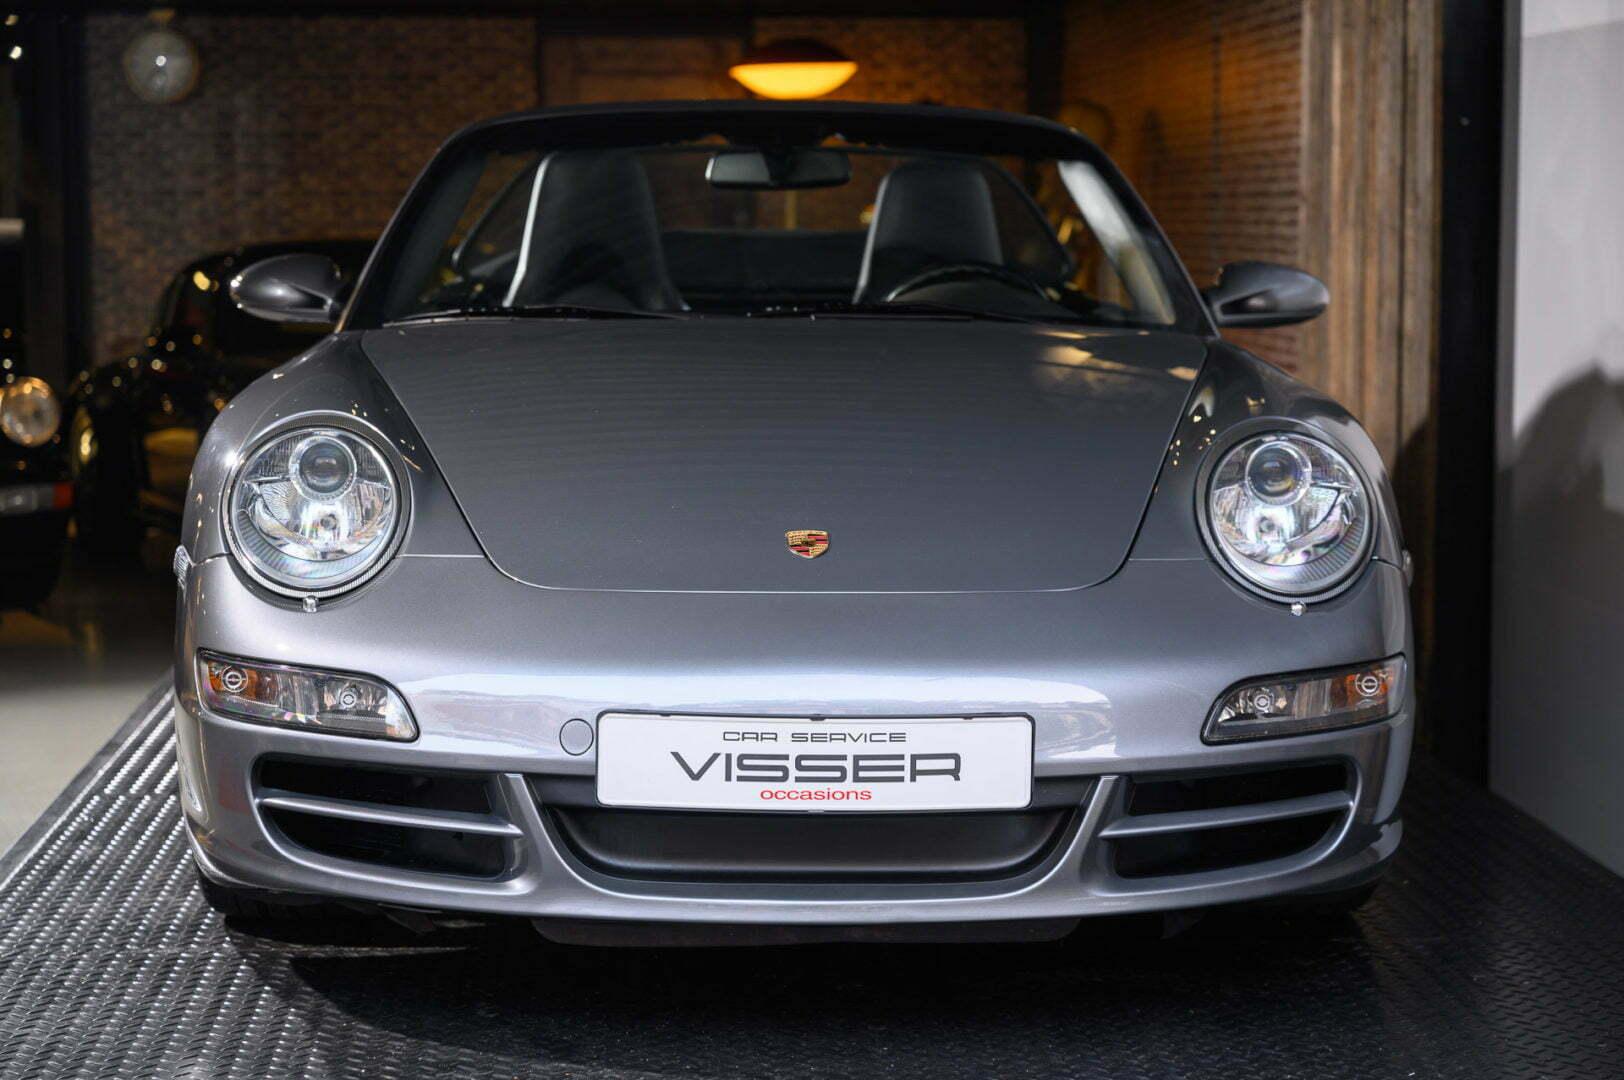 Porsche 997 2S Cabriolet Sealgrau-metallic incl. hardtop